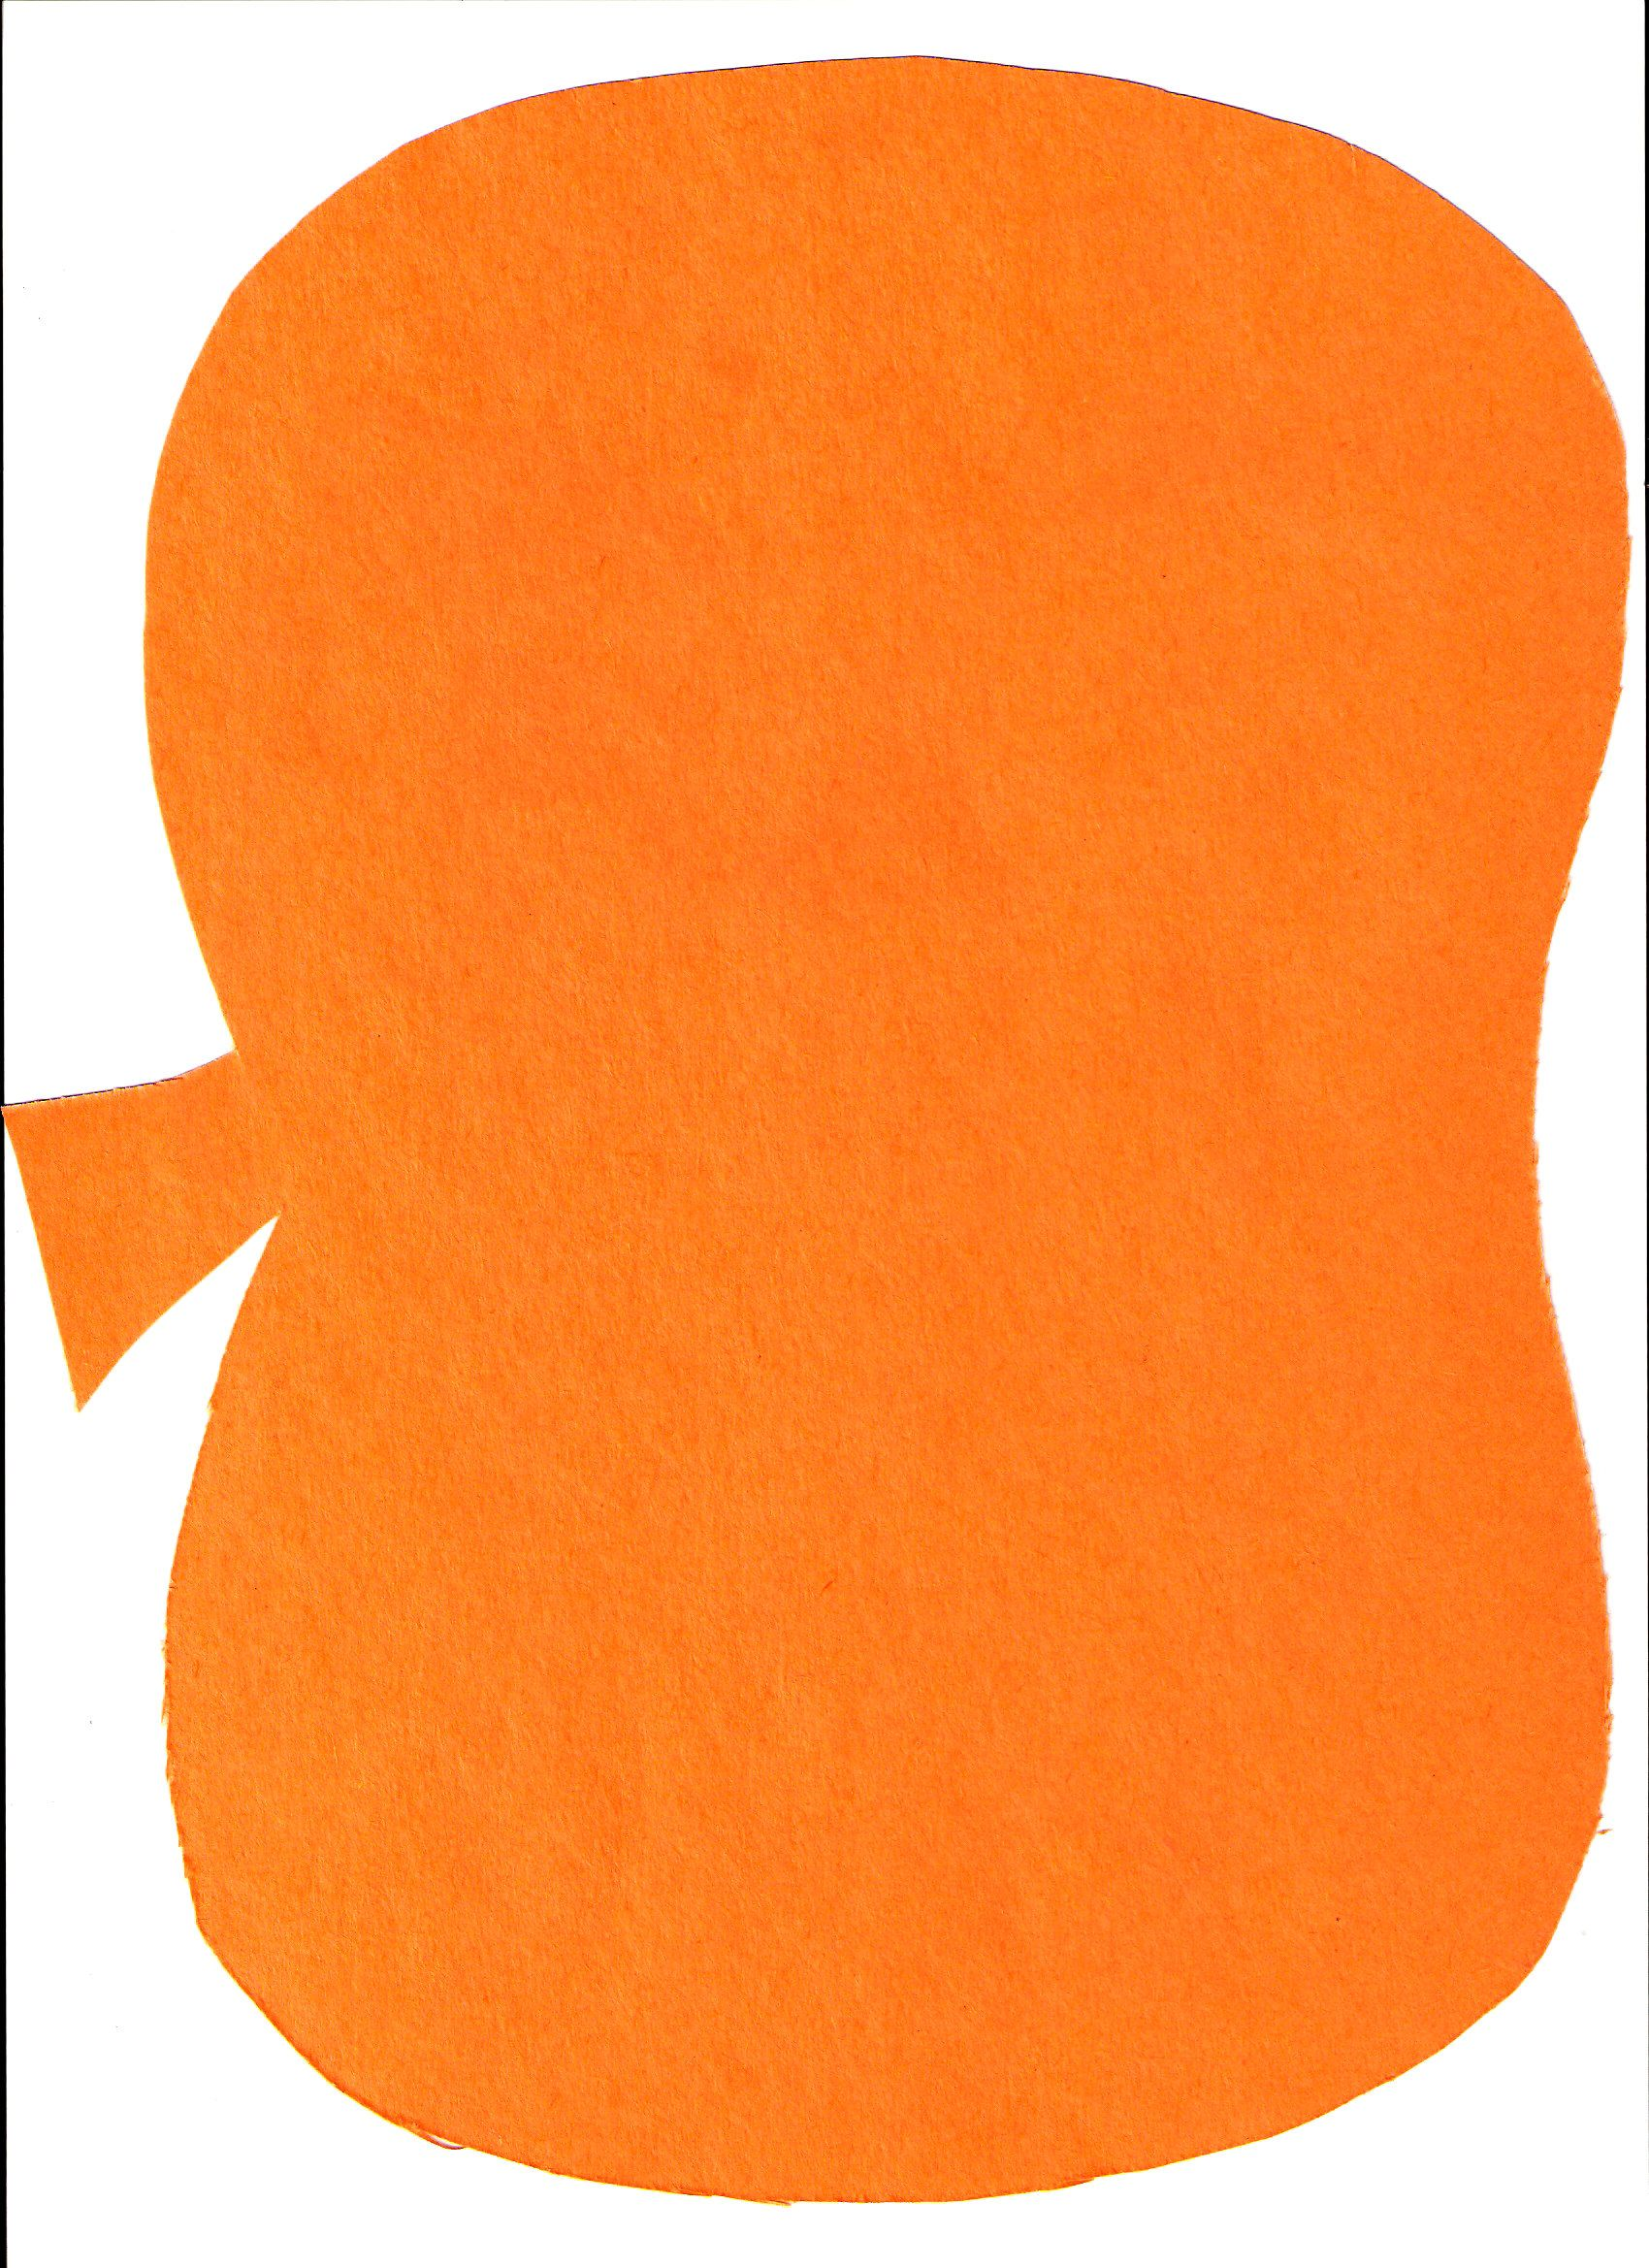 Pumpkin Templates To Print